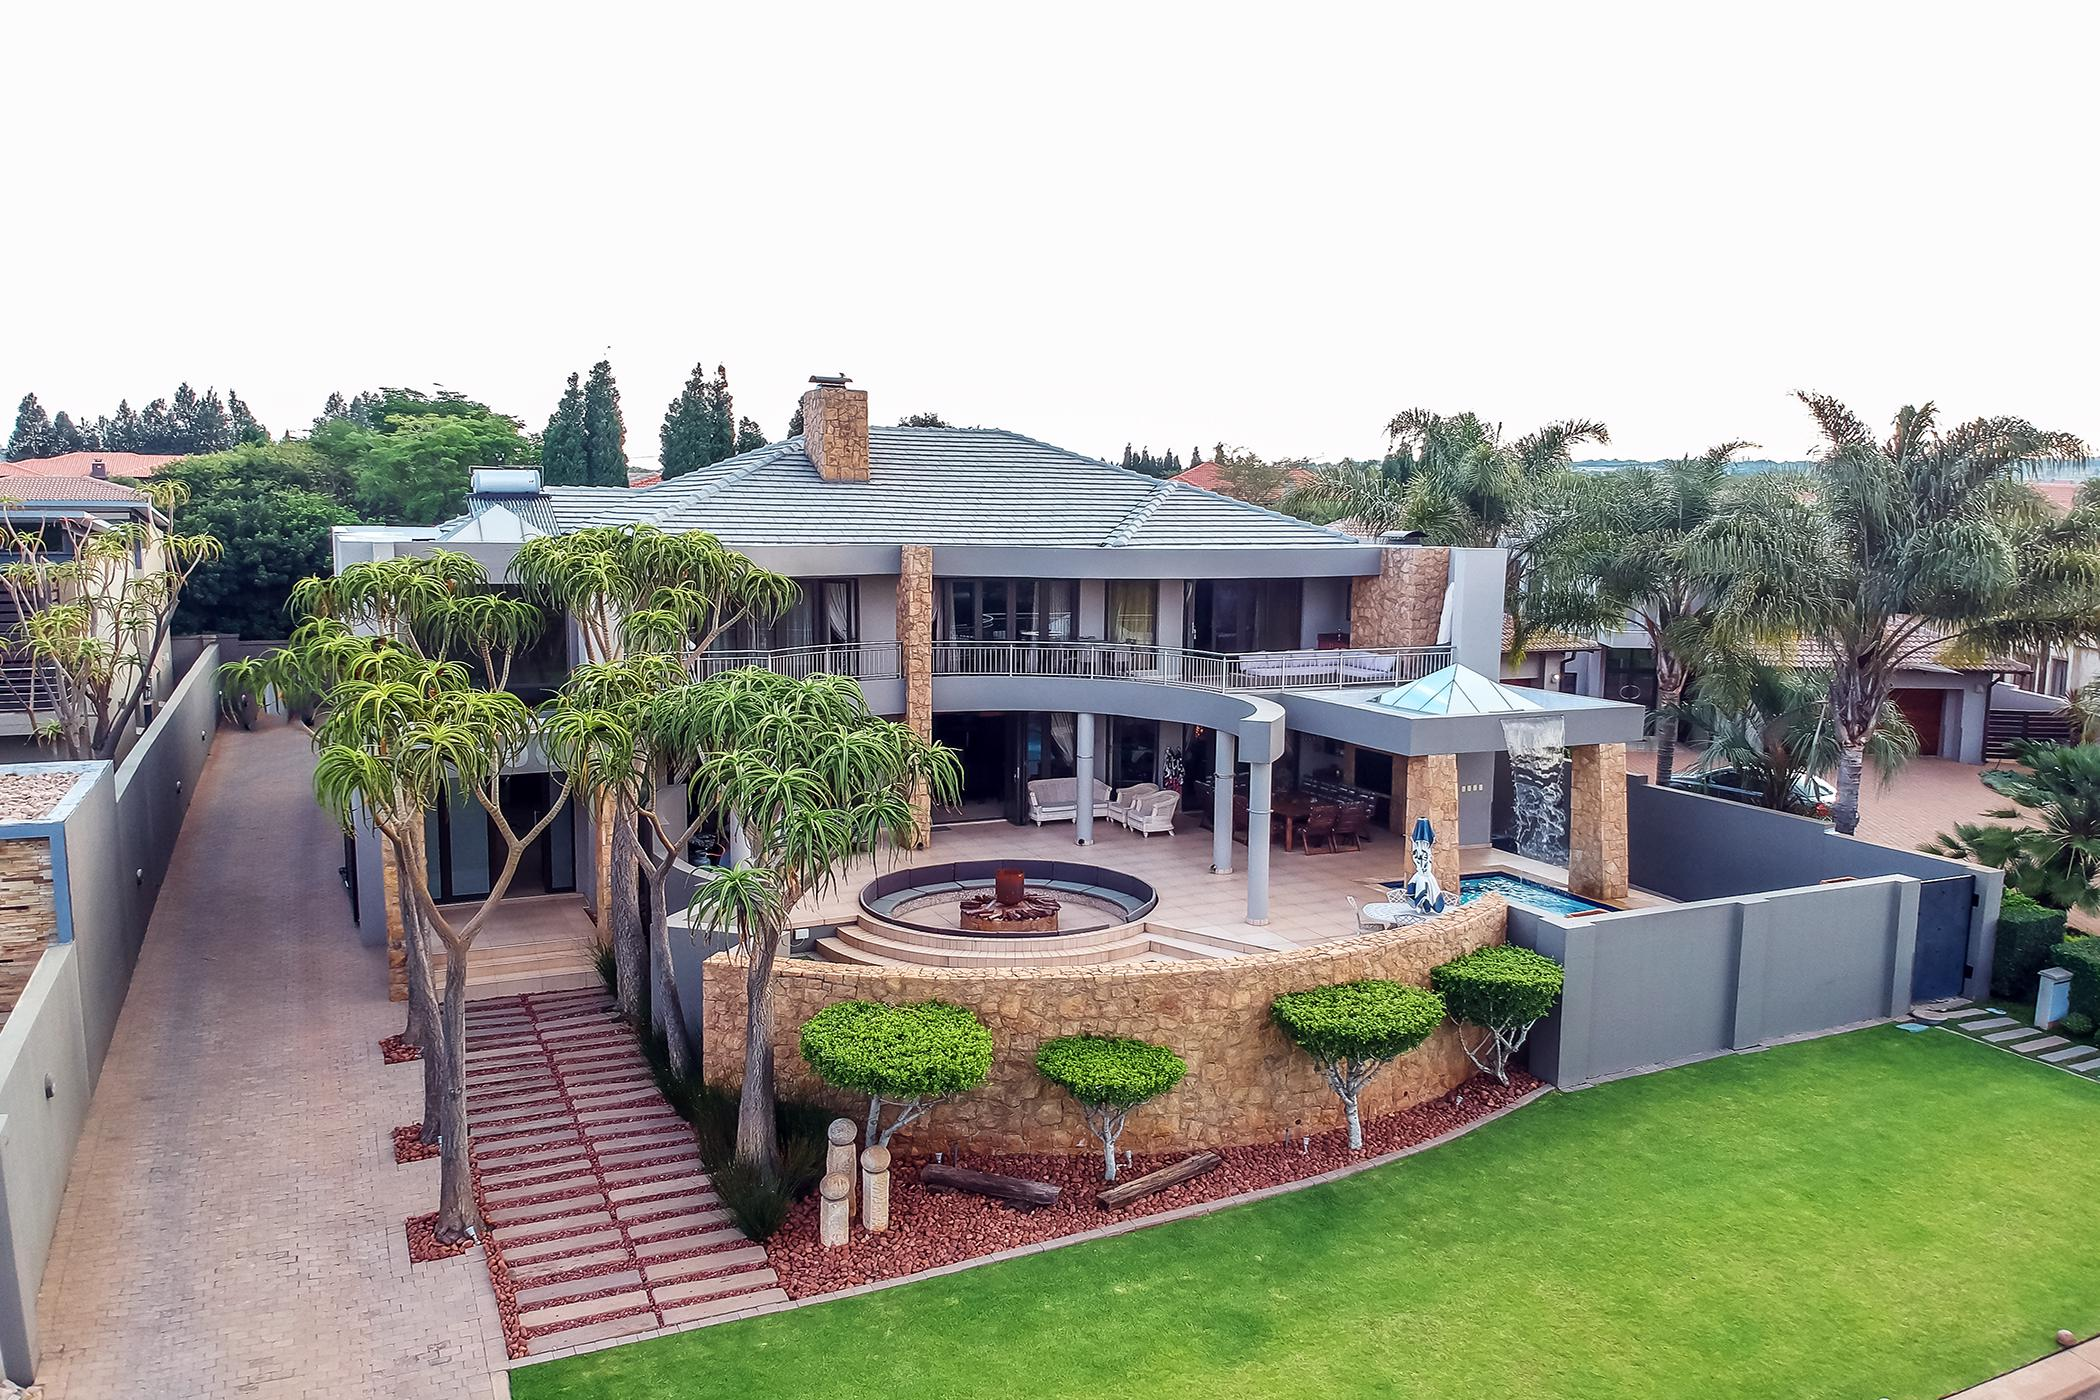 6 Bedroom House For Sale Midstream Estate Cn1448644 Pam Golding Properties